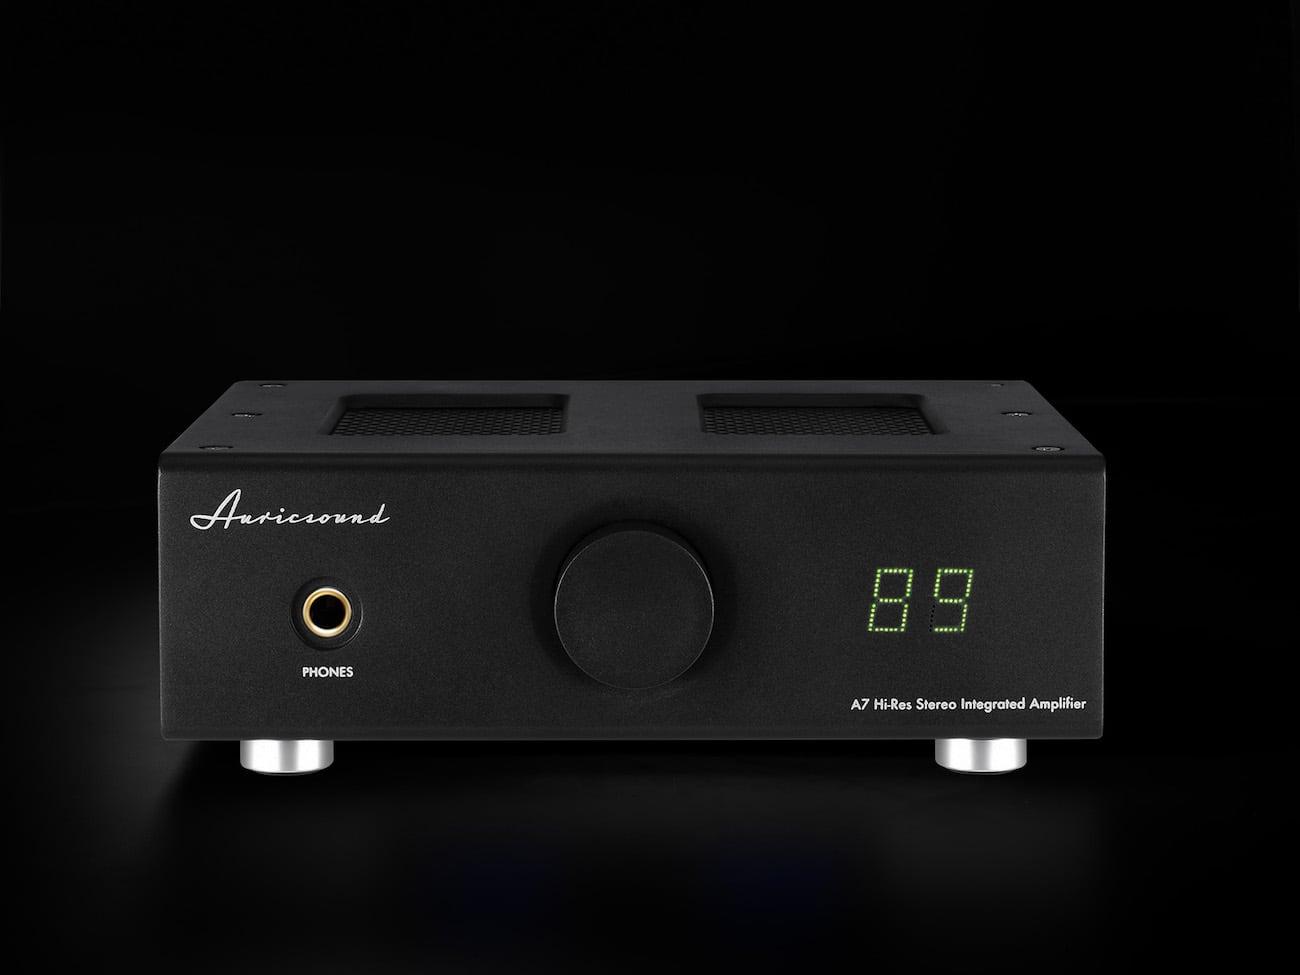 AuricSound A7 Vacuum Tube Amp Stereo Hybrid